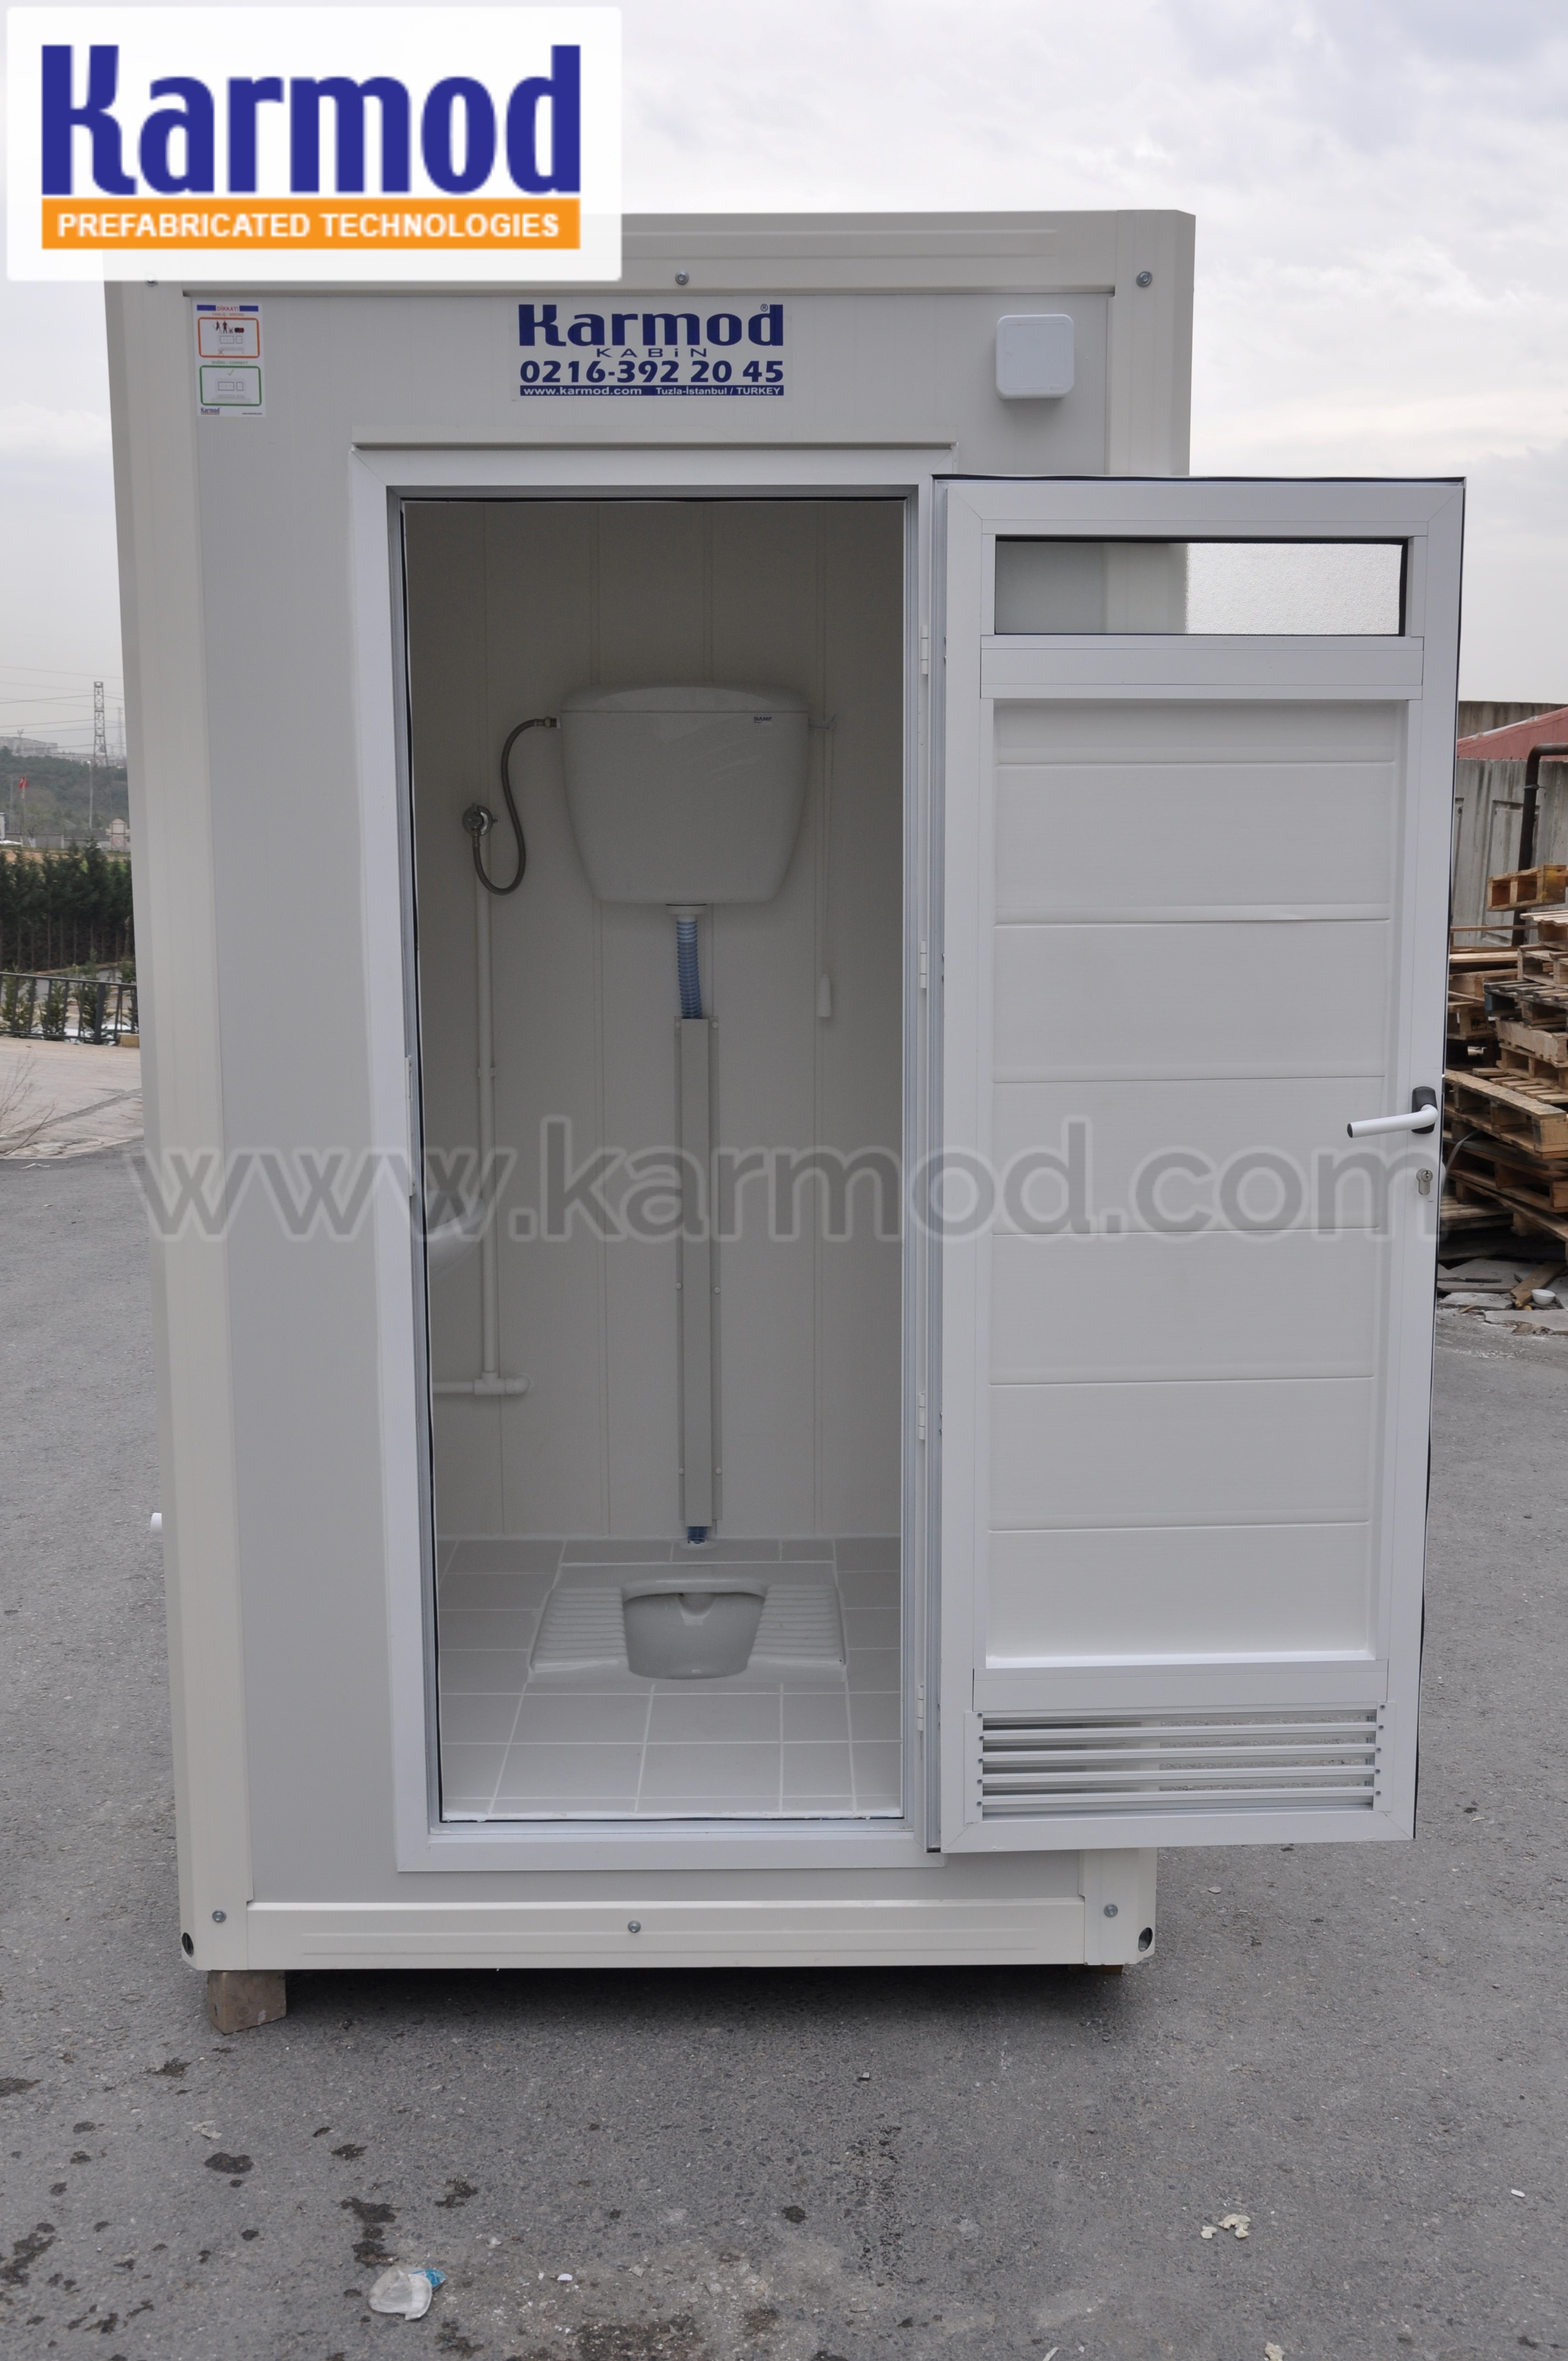 restrooms wc portable